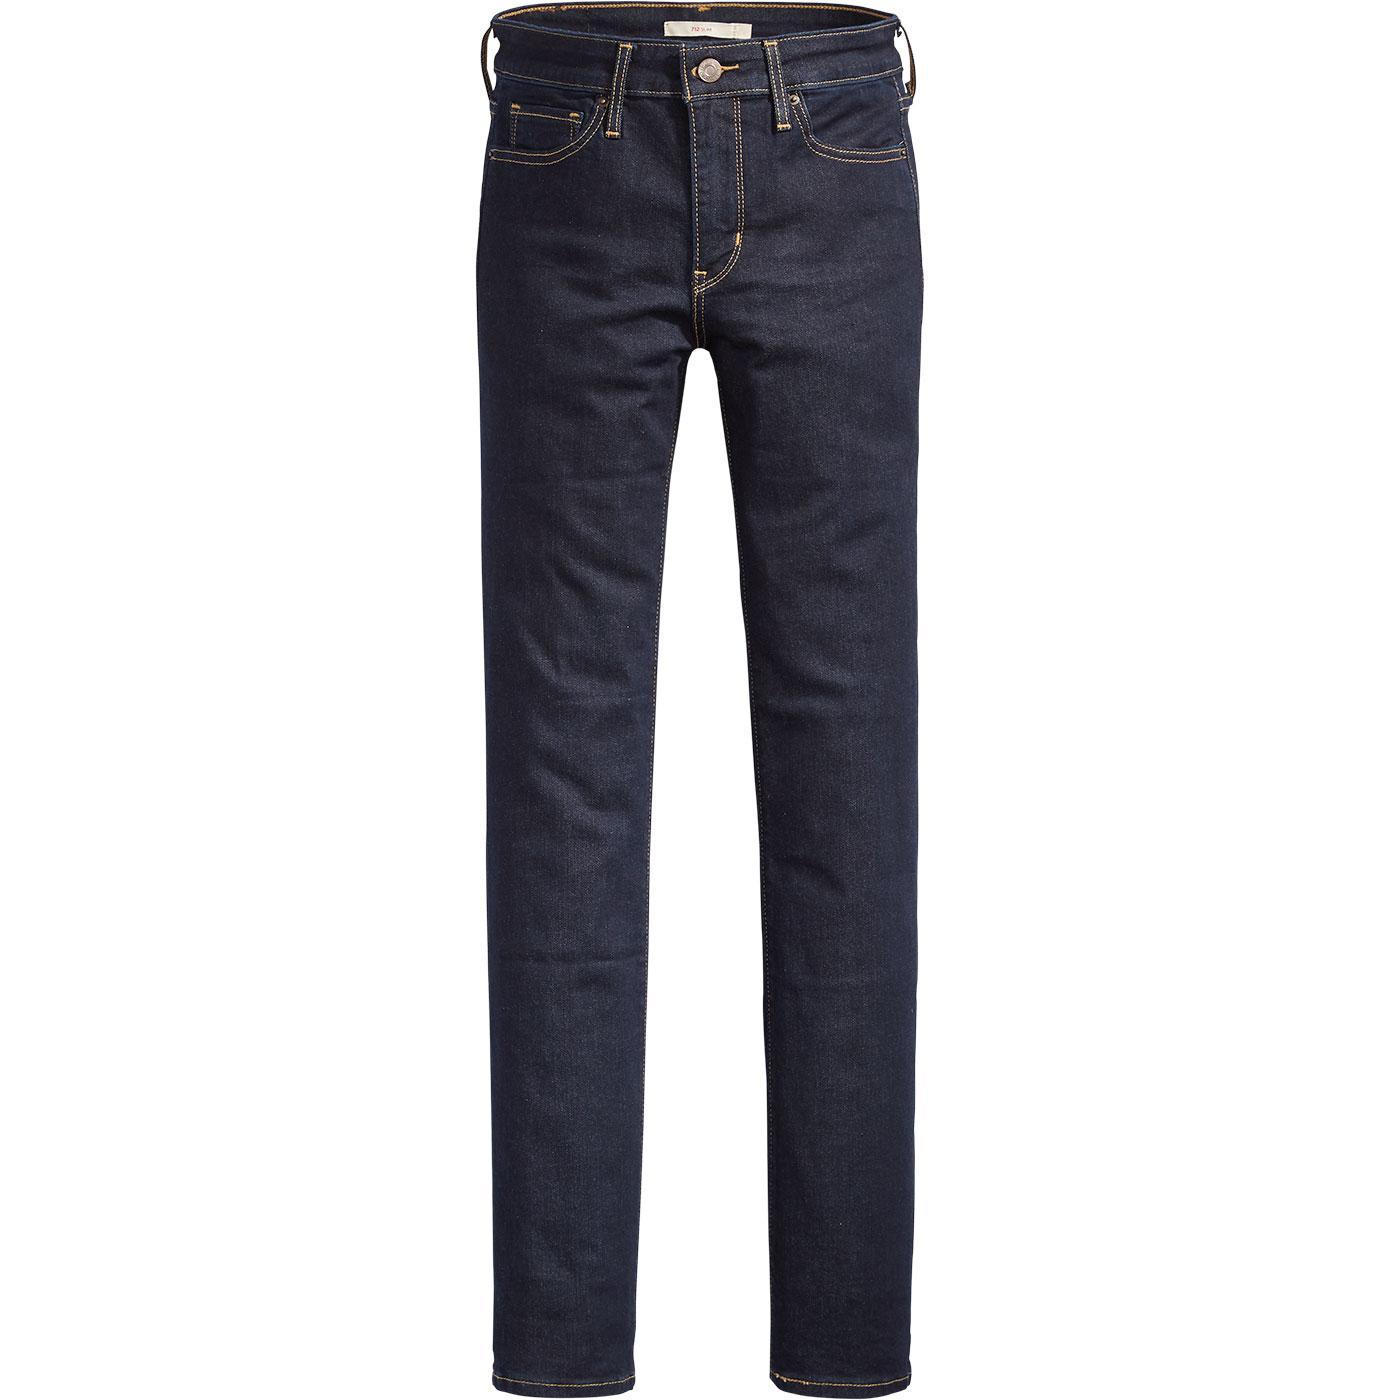 LEVI'S 712 Women's  Slim Jeans - To The Nine